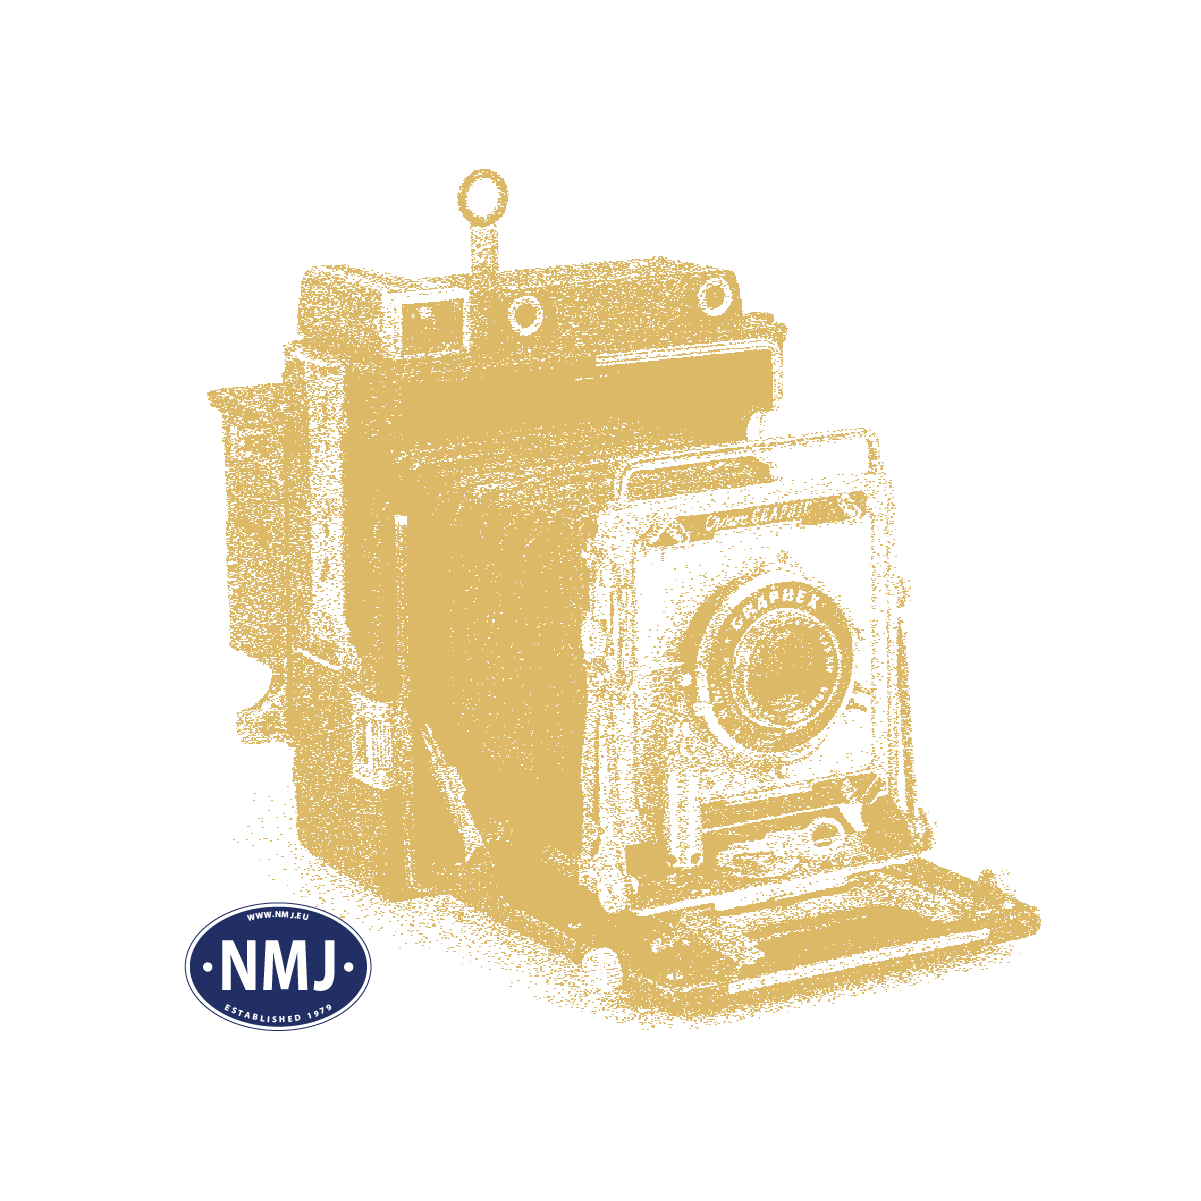 NMJH15104 - NMJ Skyline Modell einer Laderampe, Fertigmodell